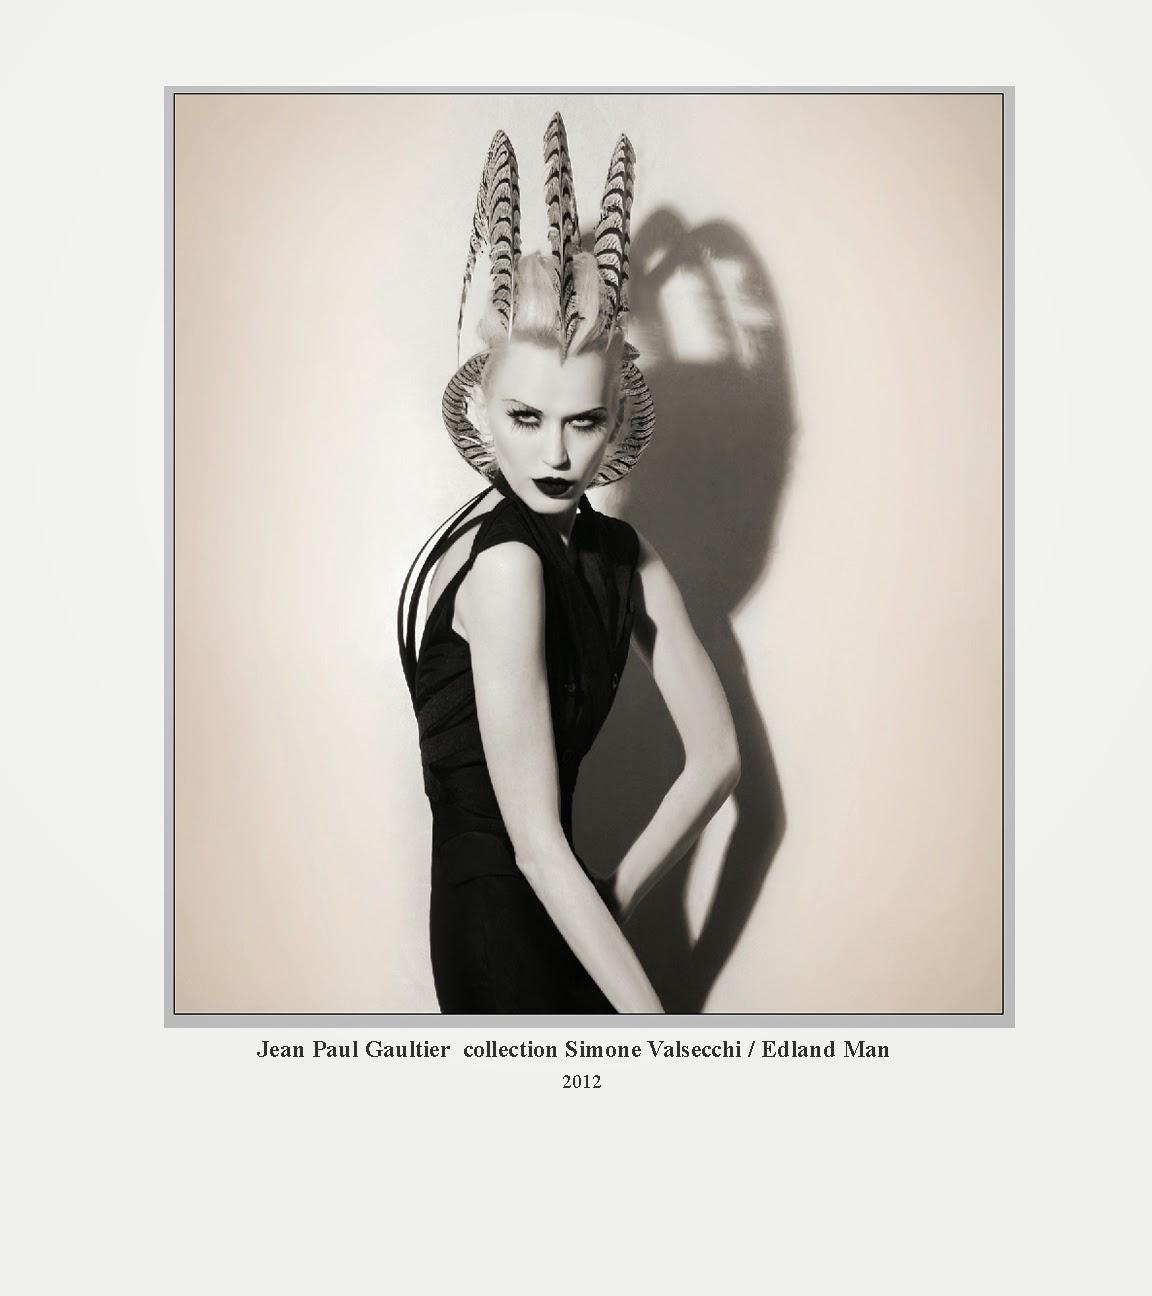 http://www.edlandman.com/fashion-Gaultier.htm